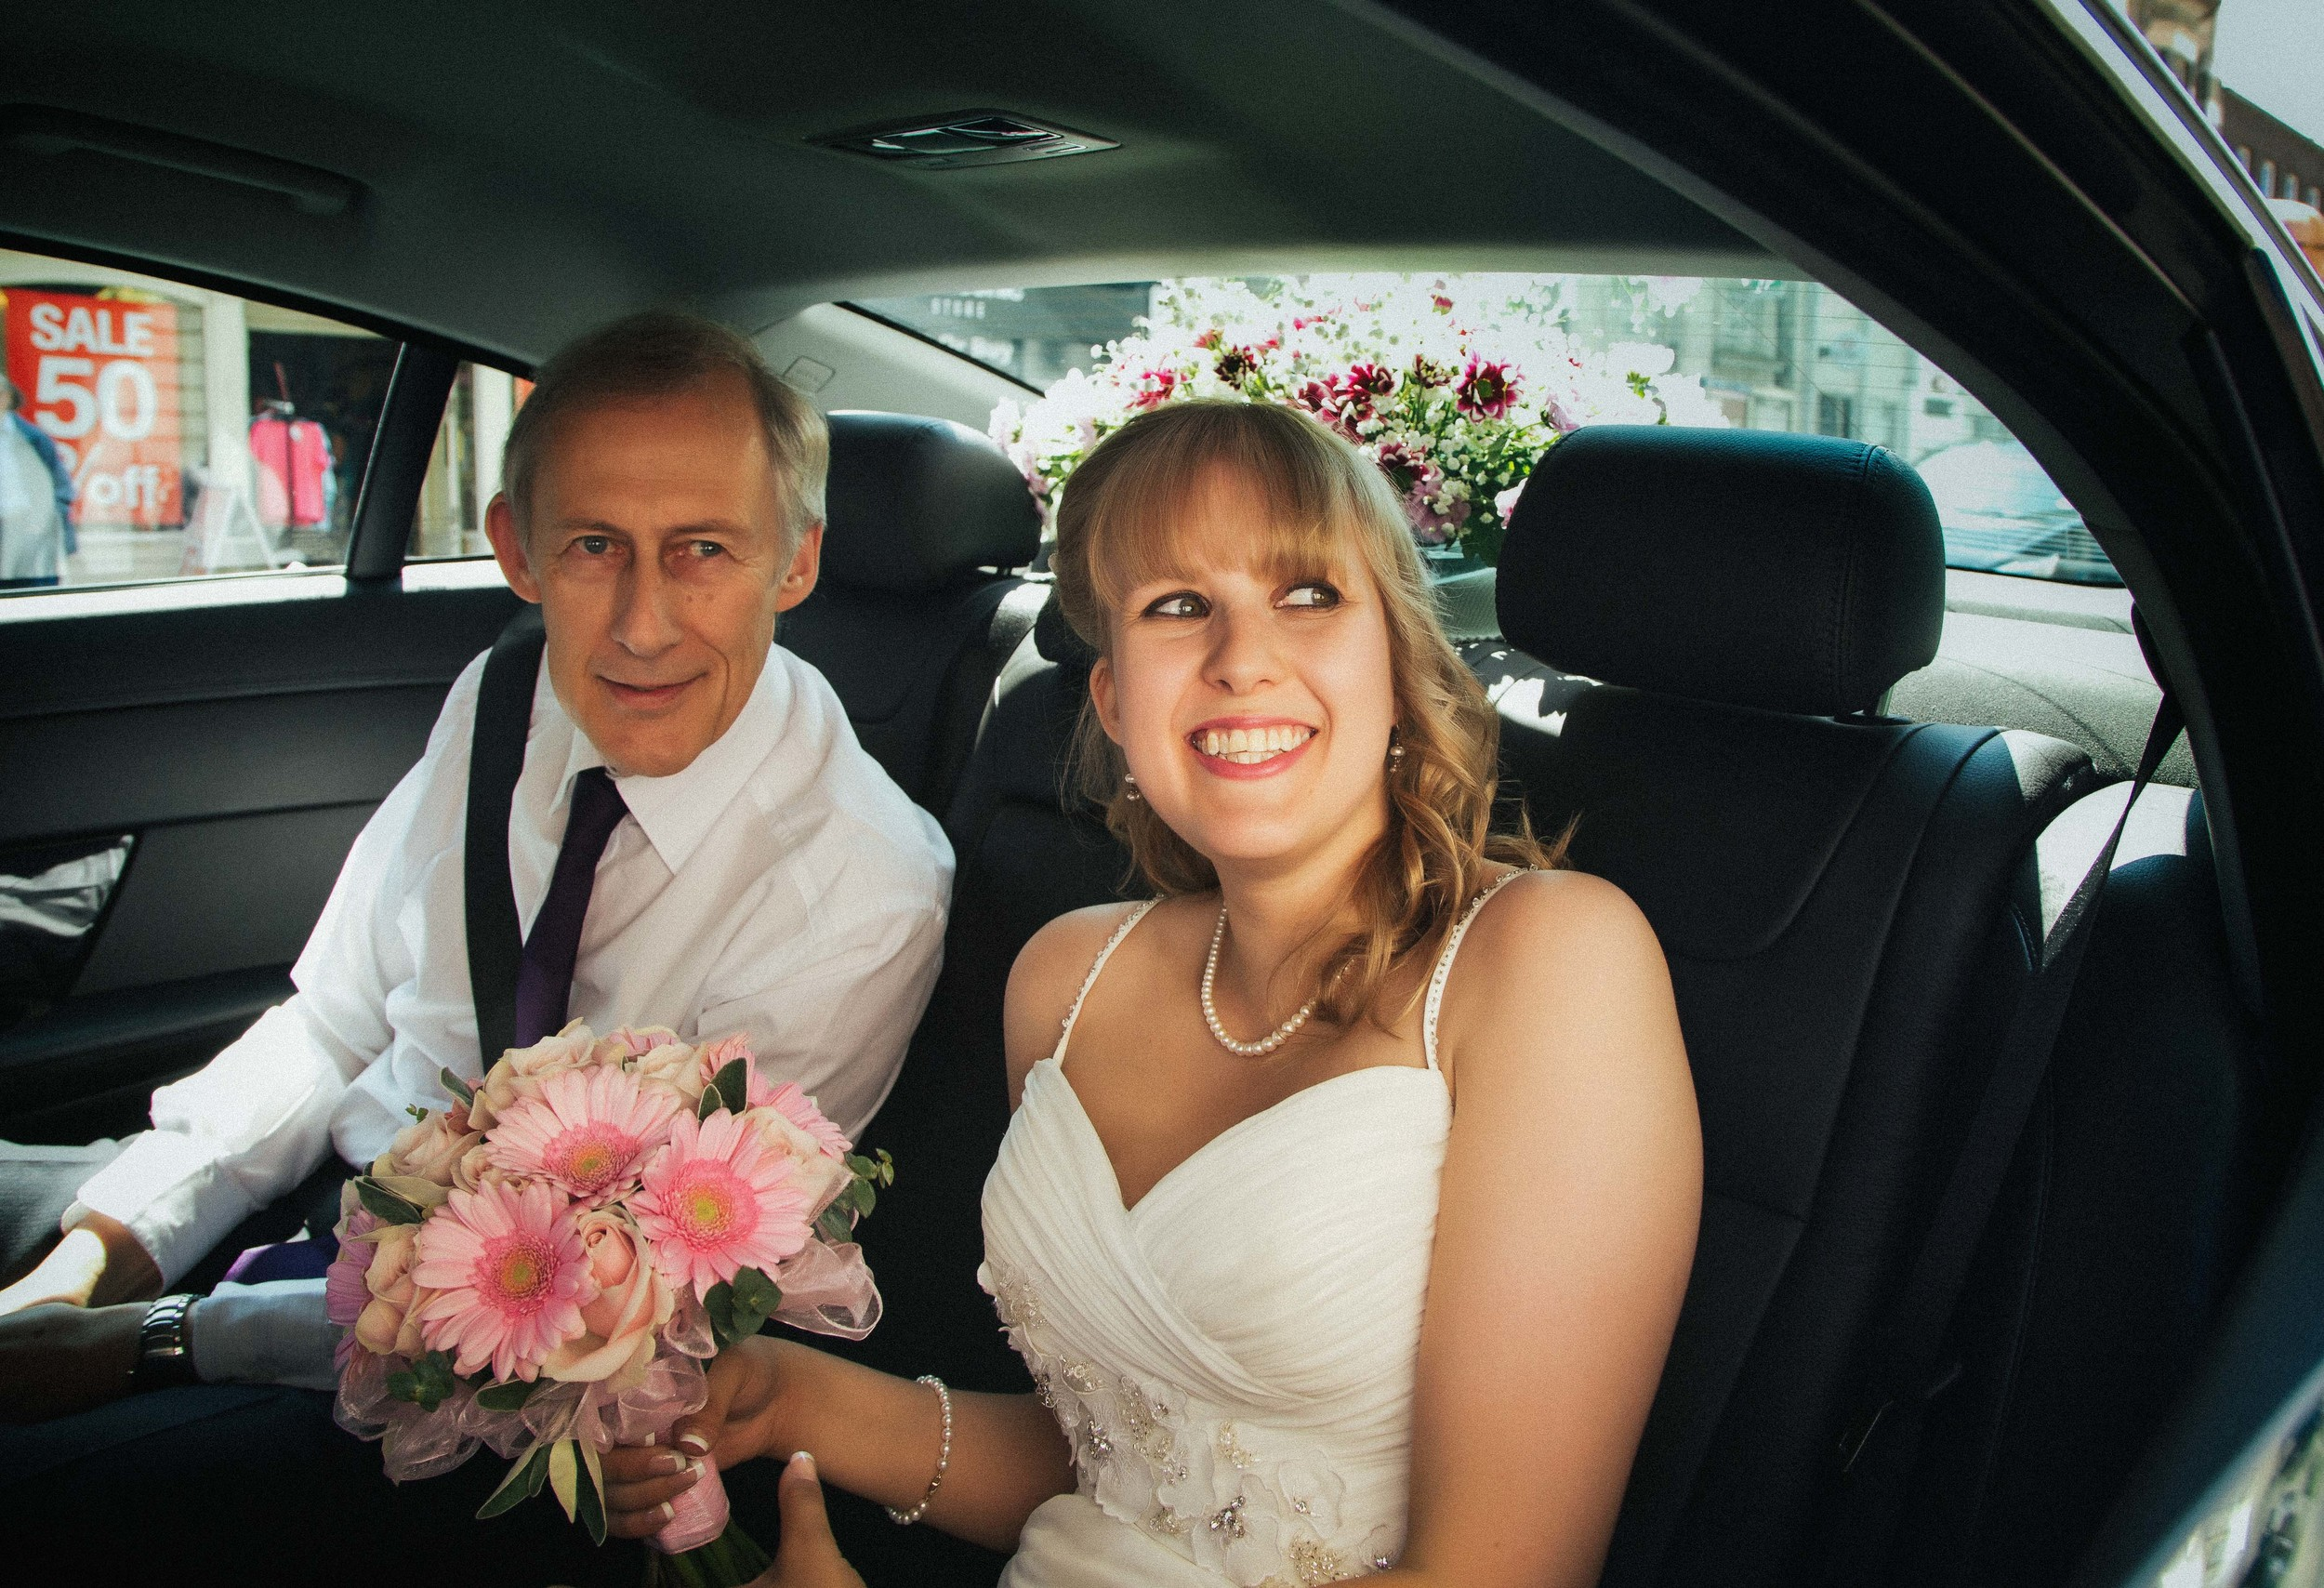 colchester-wedding-car-london-uk-destination-wedding-photography-Adam-Rowley